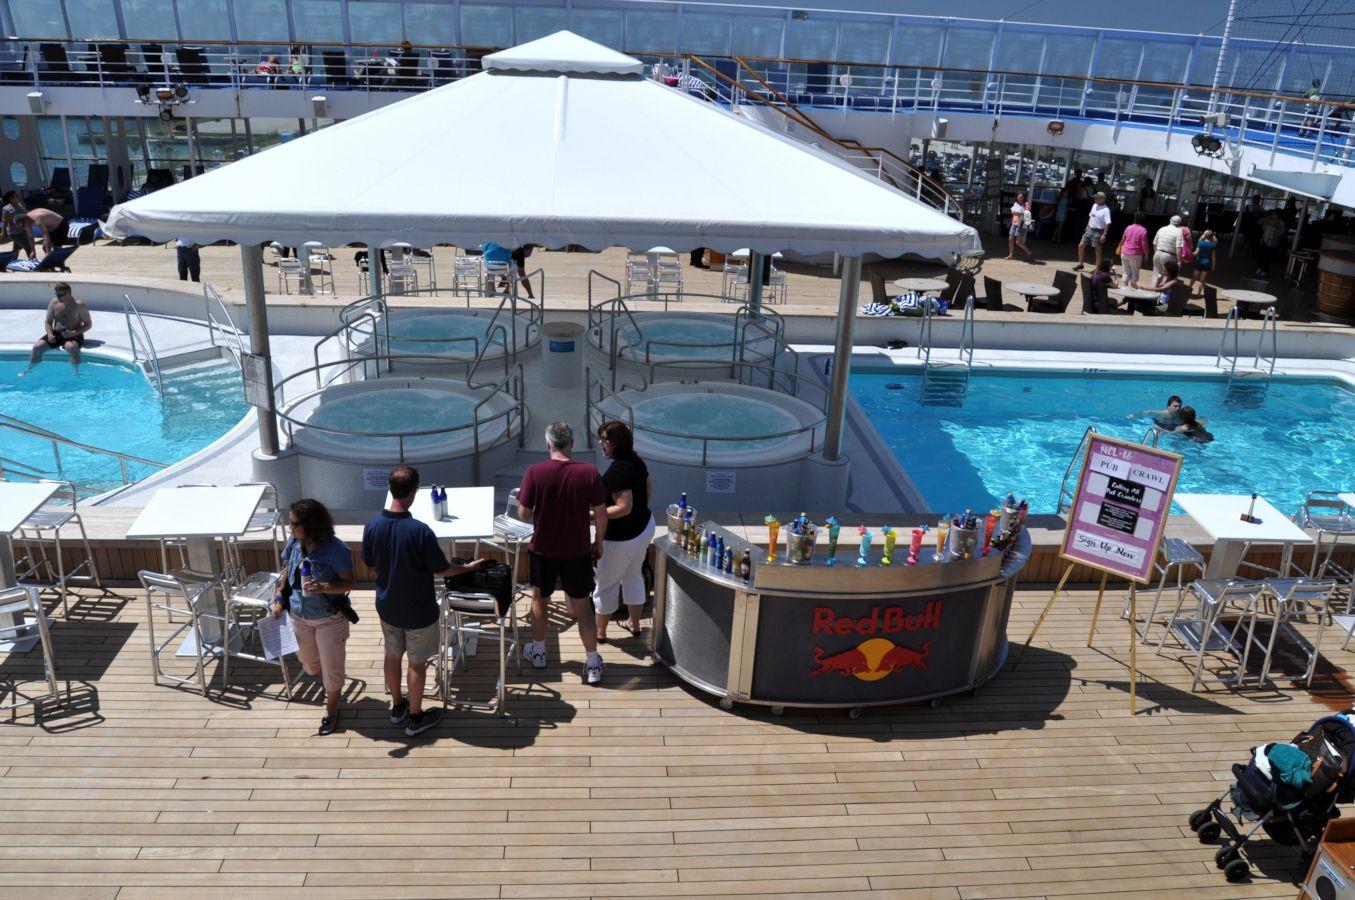 Norwegian Sun Cruise photos | ... Travel and Tours: Ship Inspection: Norwegian Cruise Line - Come Along